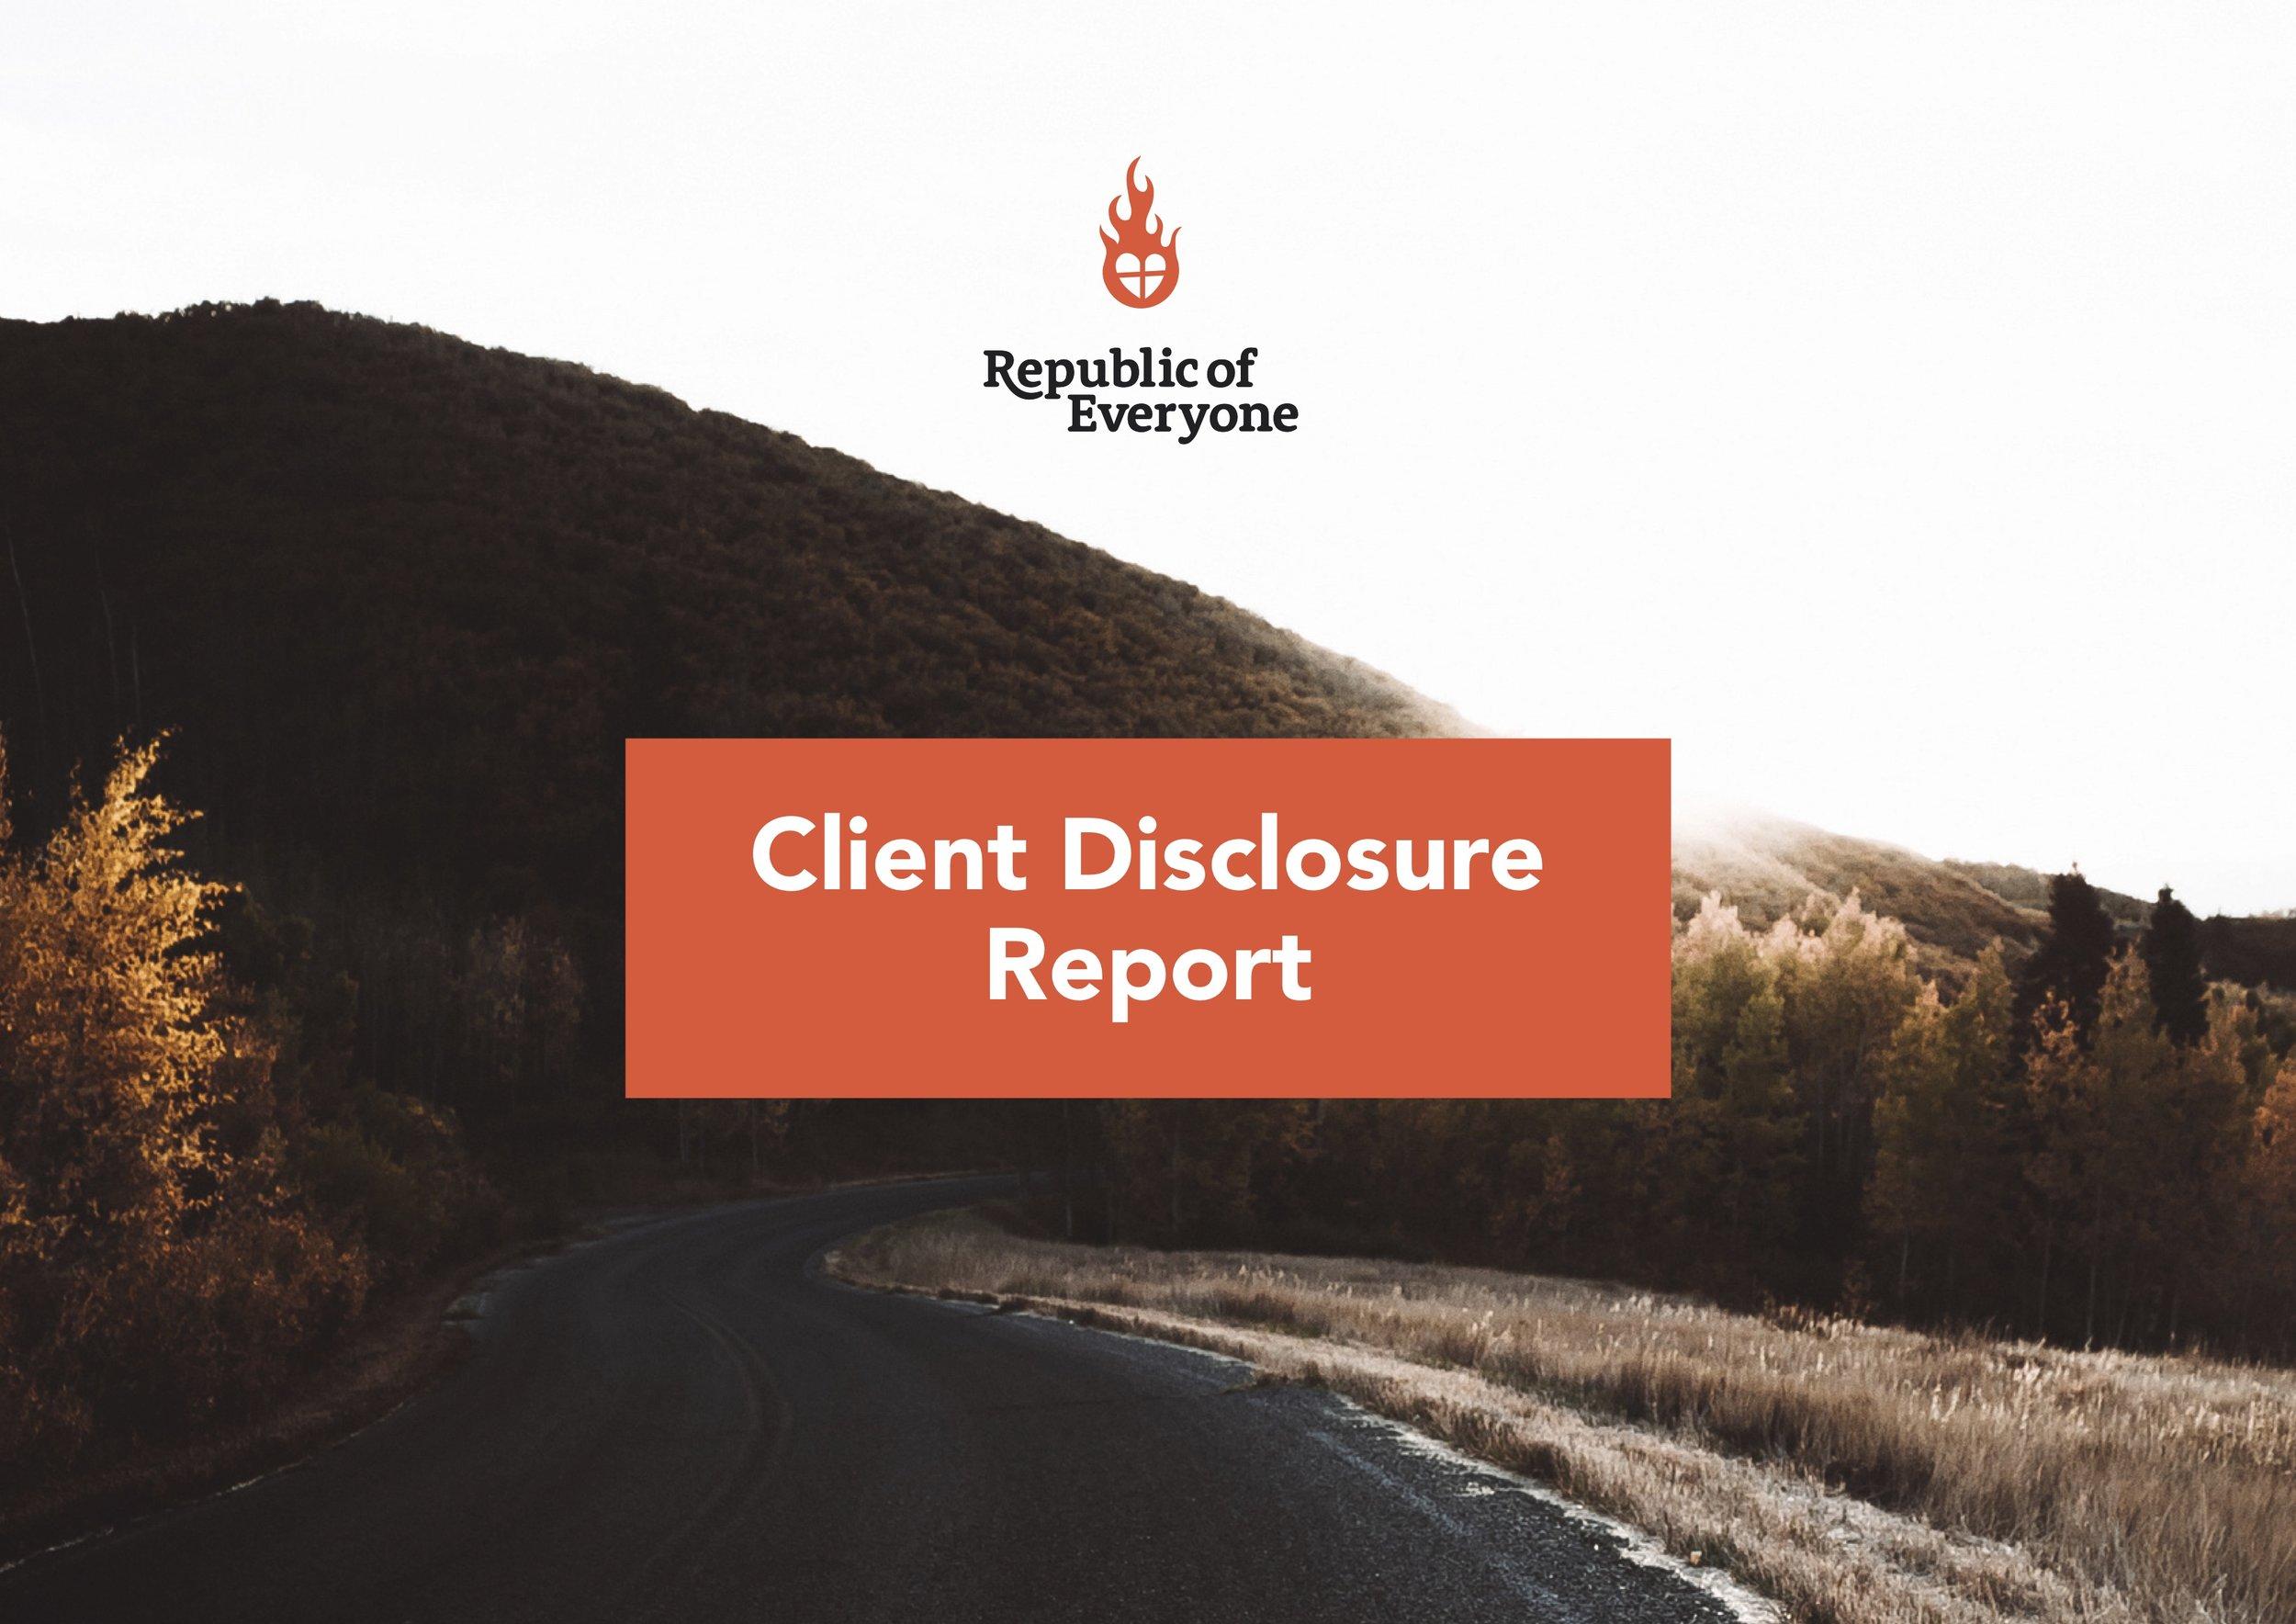 Client Disclosure Report_ROE.jpg